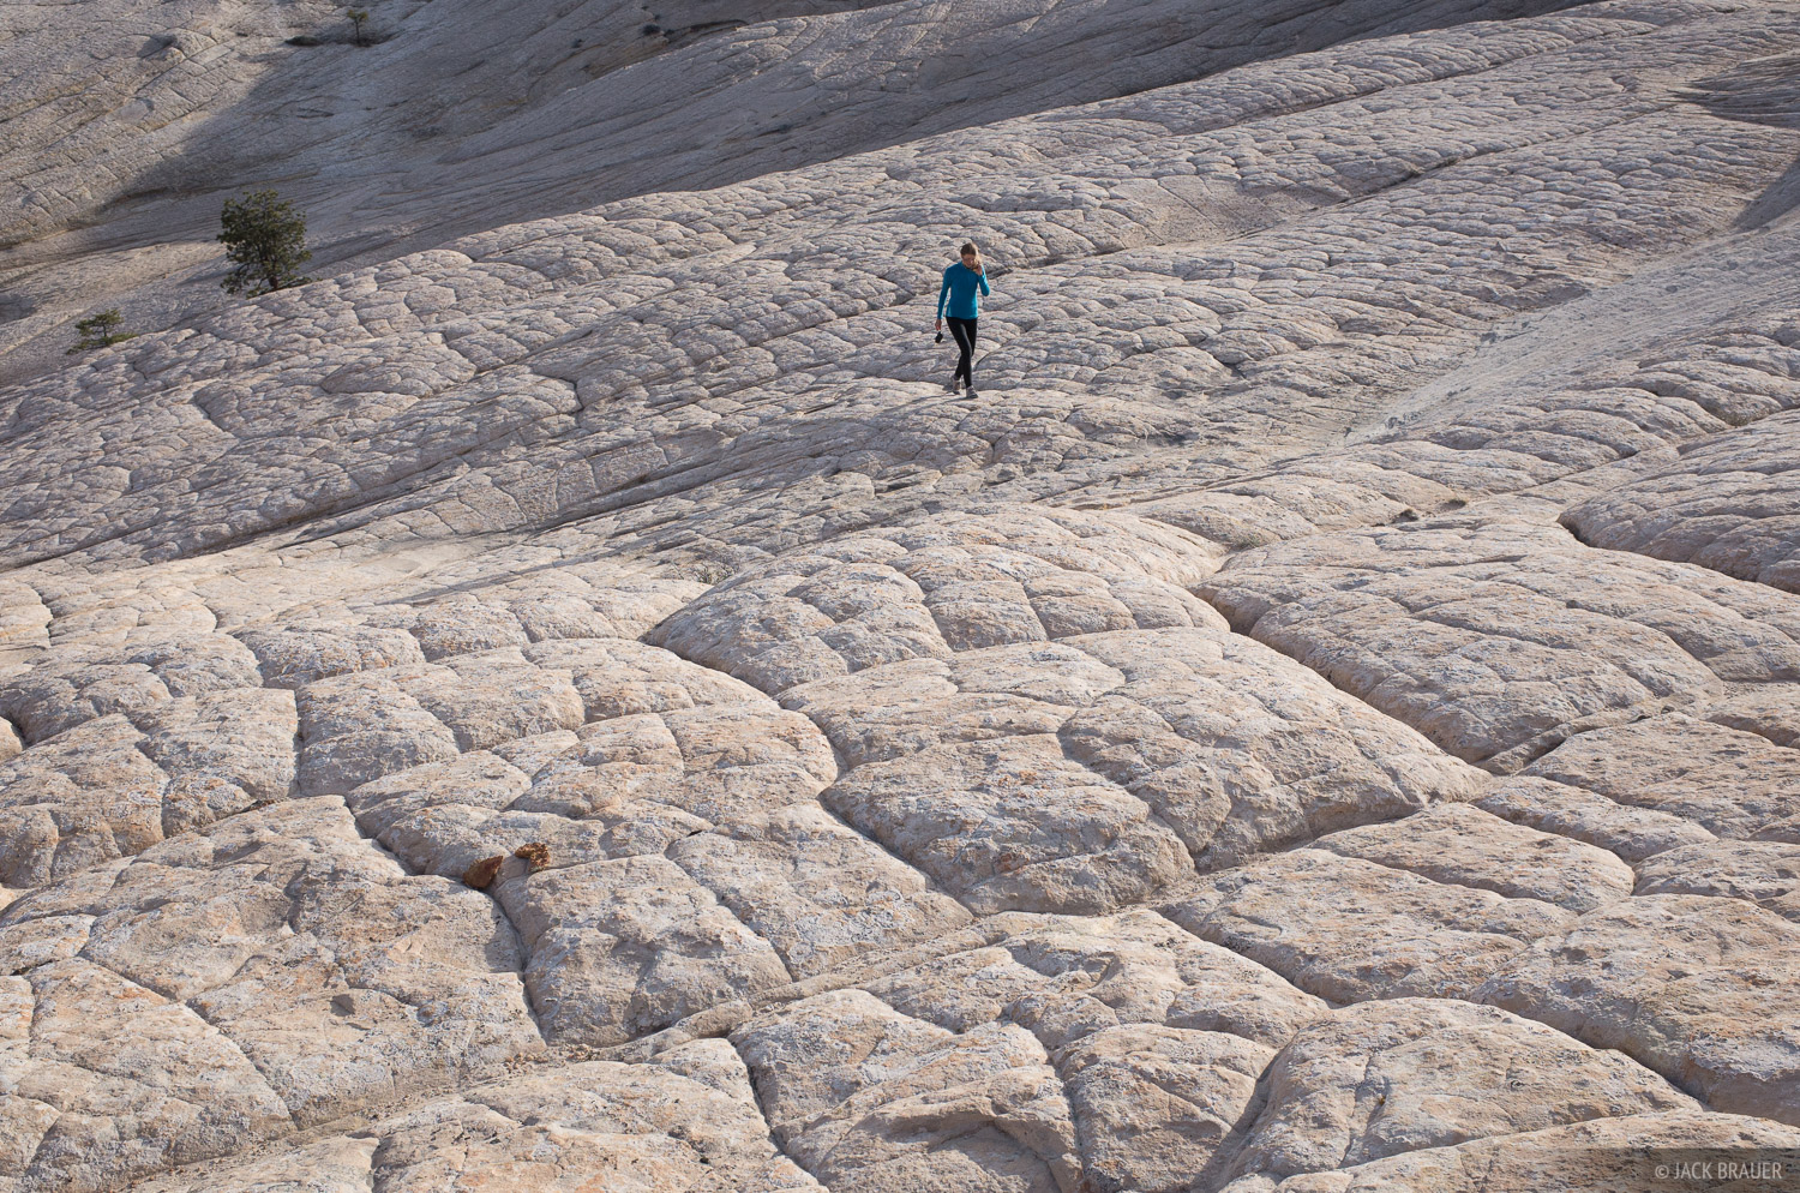 Boulder Mail Trail, Escalante, Escalante National Monument, Utah, Grand Staircase-Escalante National Monument, photo